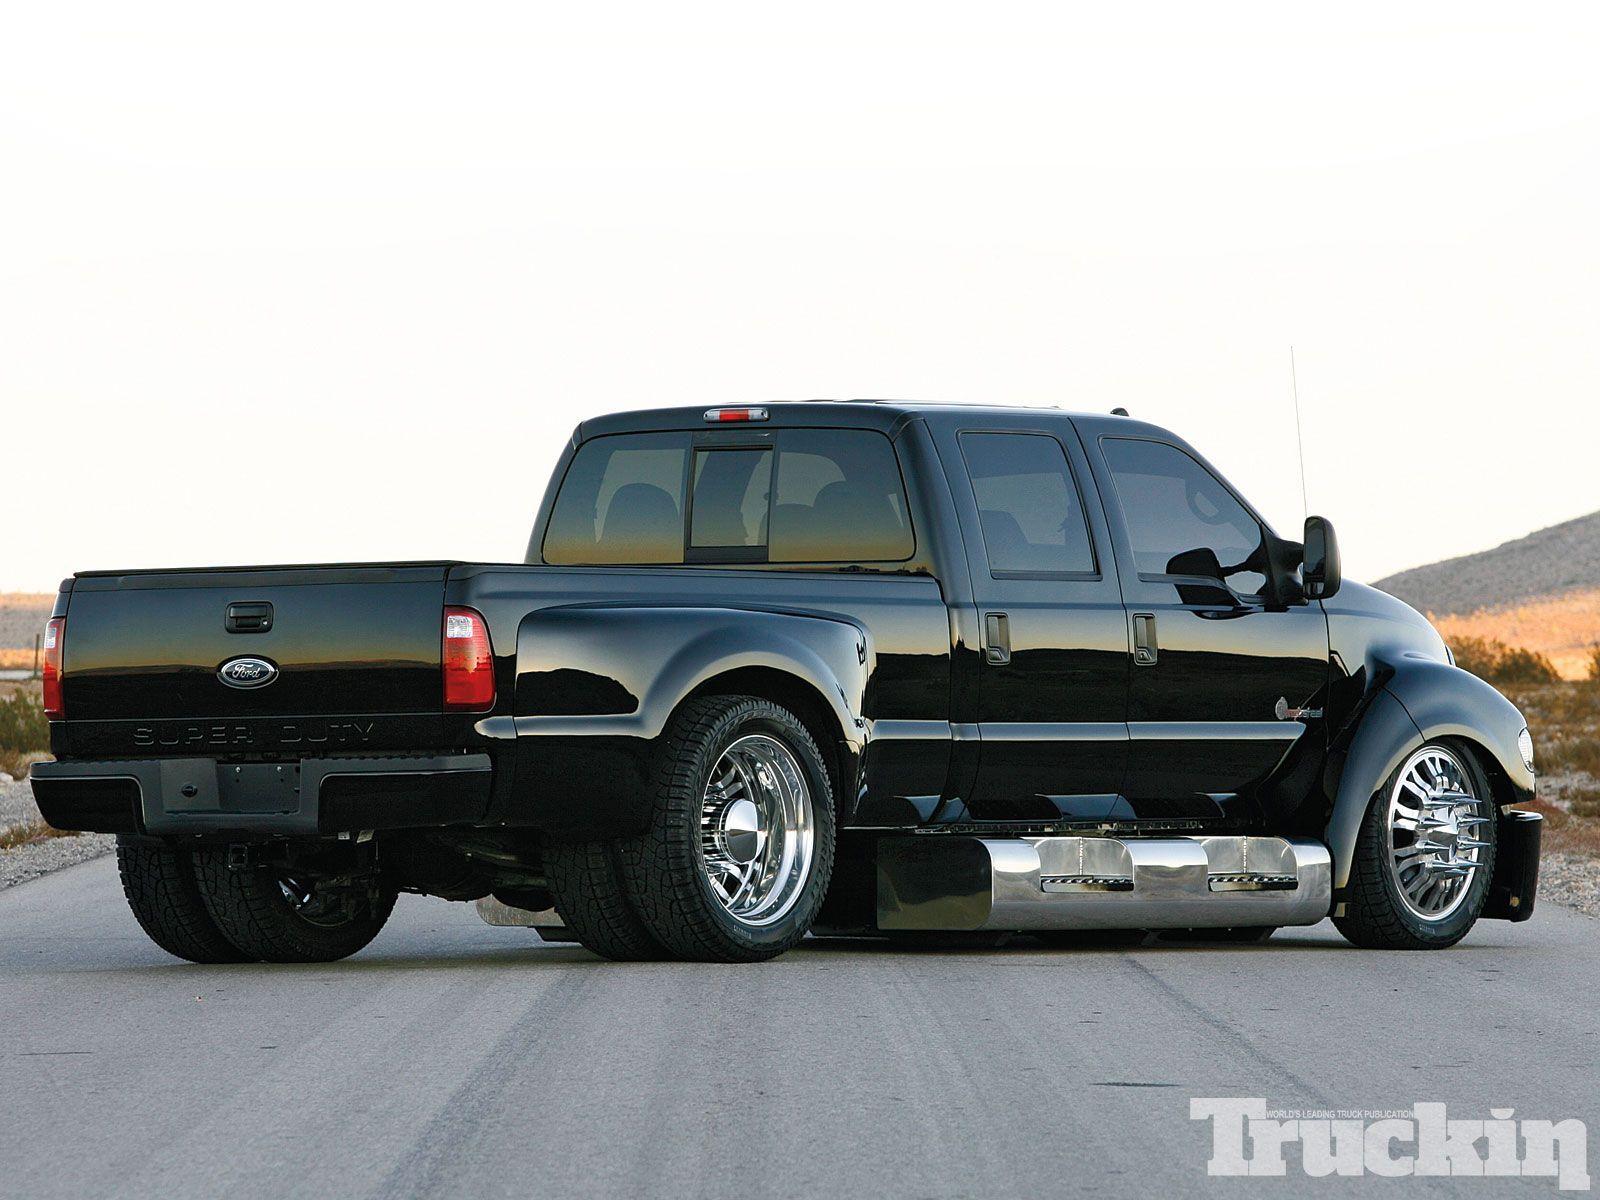 2008 ford f650 rear angle